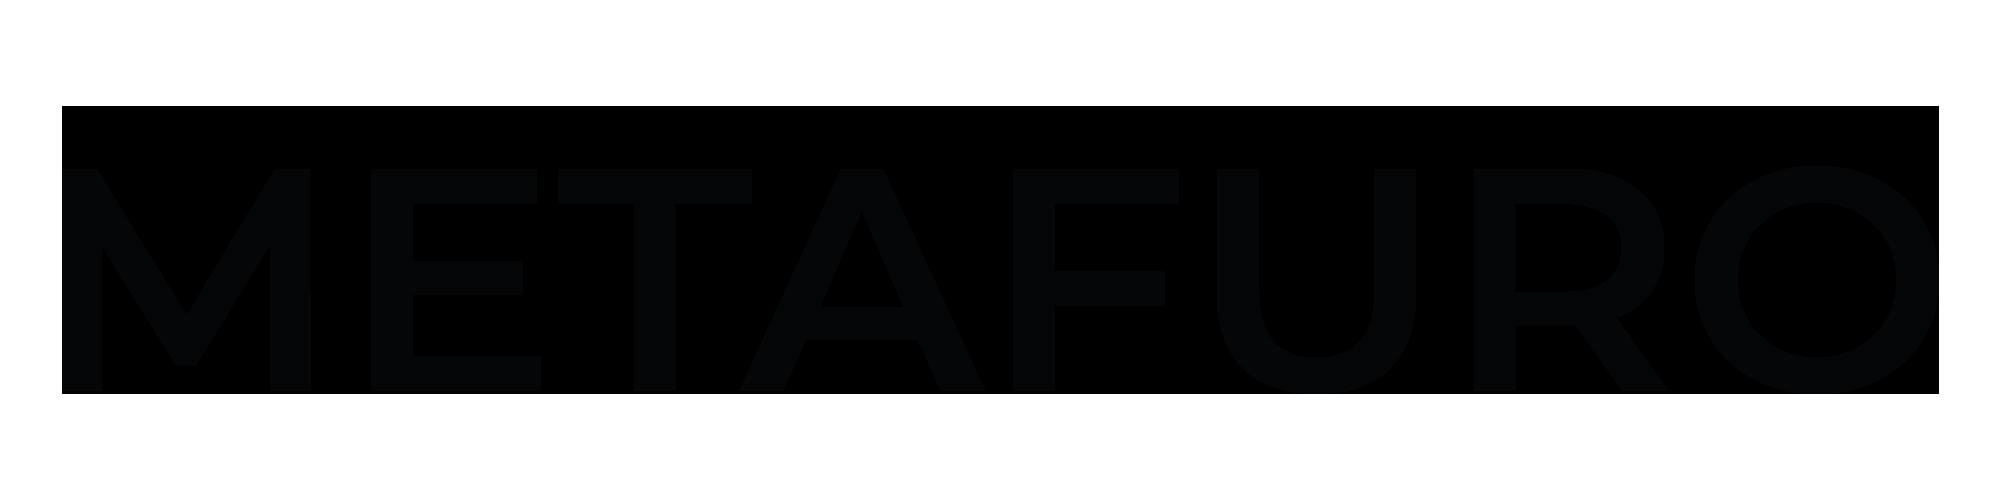 metafuro logo